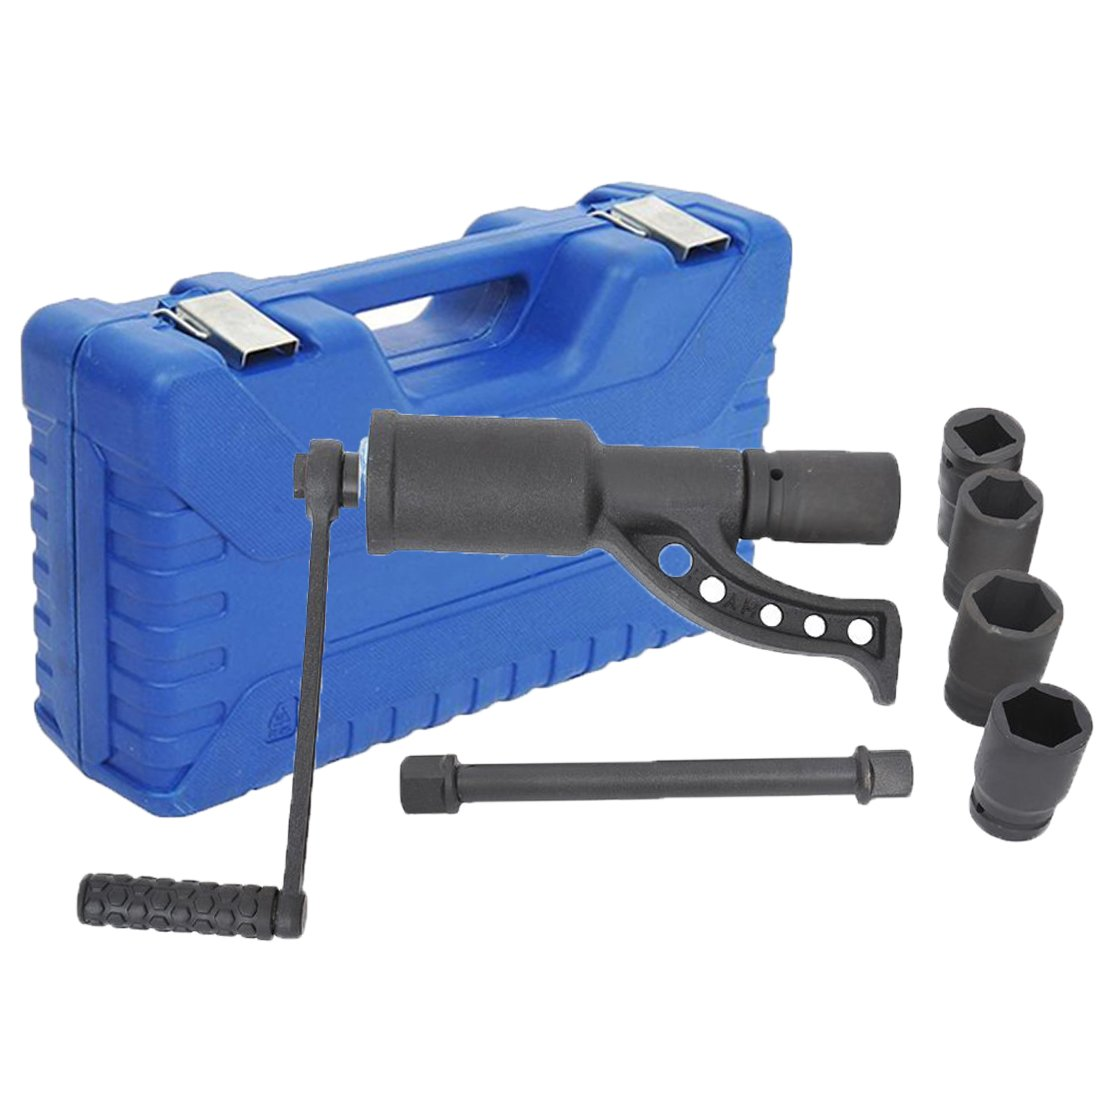 Tenive Heavy Duty Lug Nut Labor Saving Tool Torque Multiplier Socket Wrench Set with Case, 4 sockets